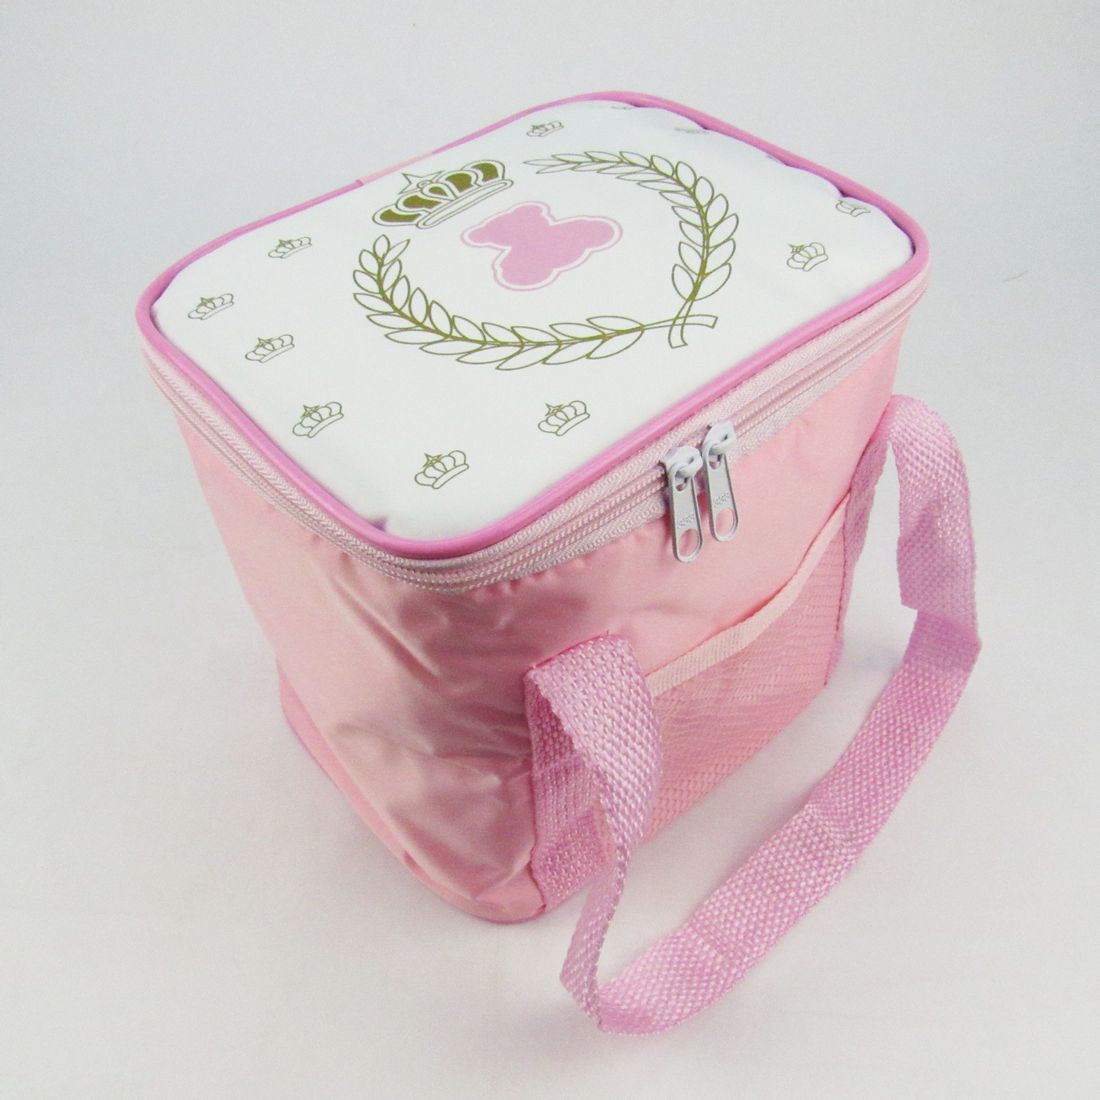 Bolsa Dourada De Bebe : Bolsa t?rmica feminina para beb? estampada coroa dourada